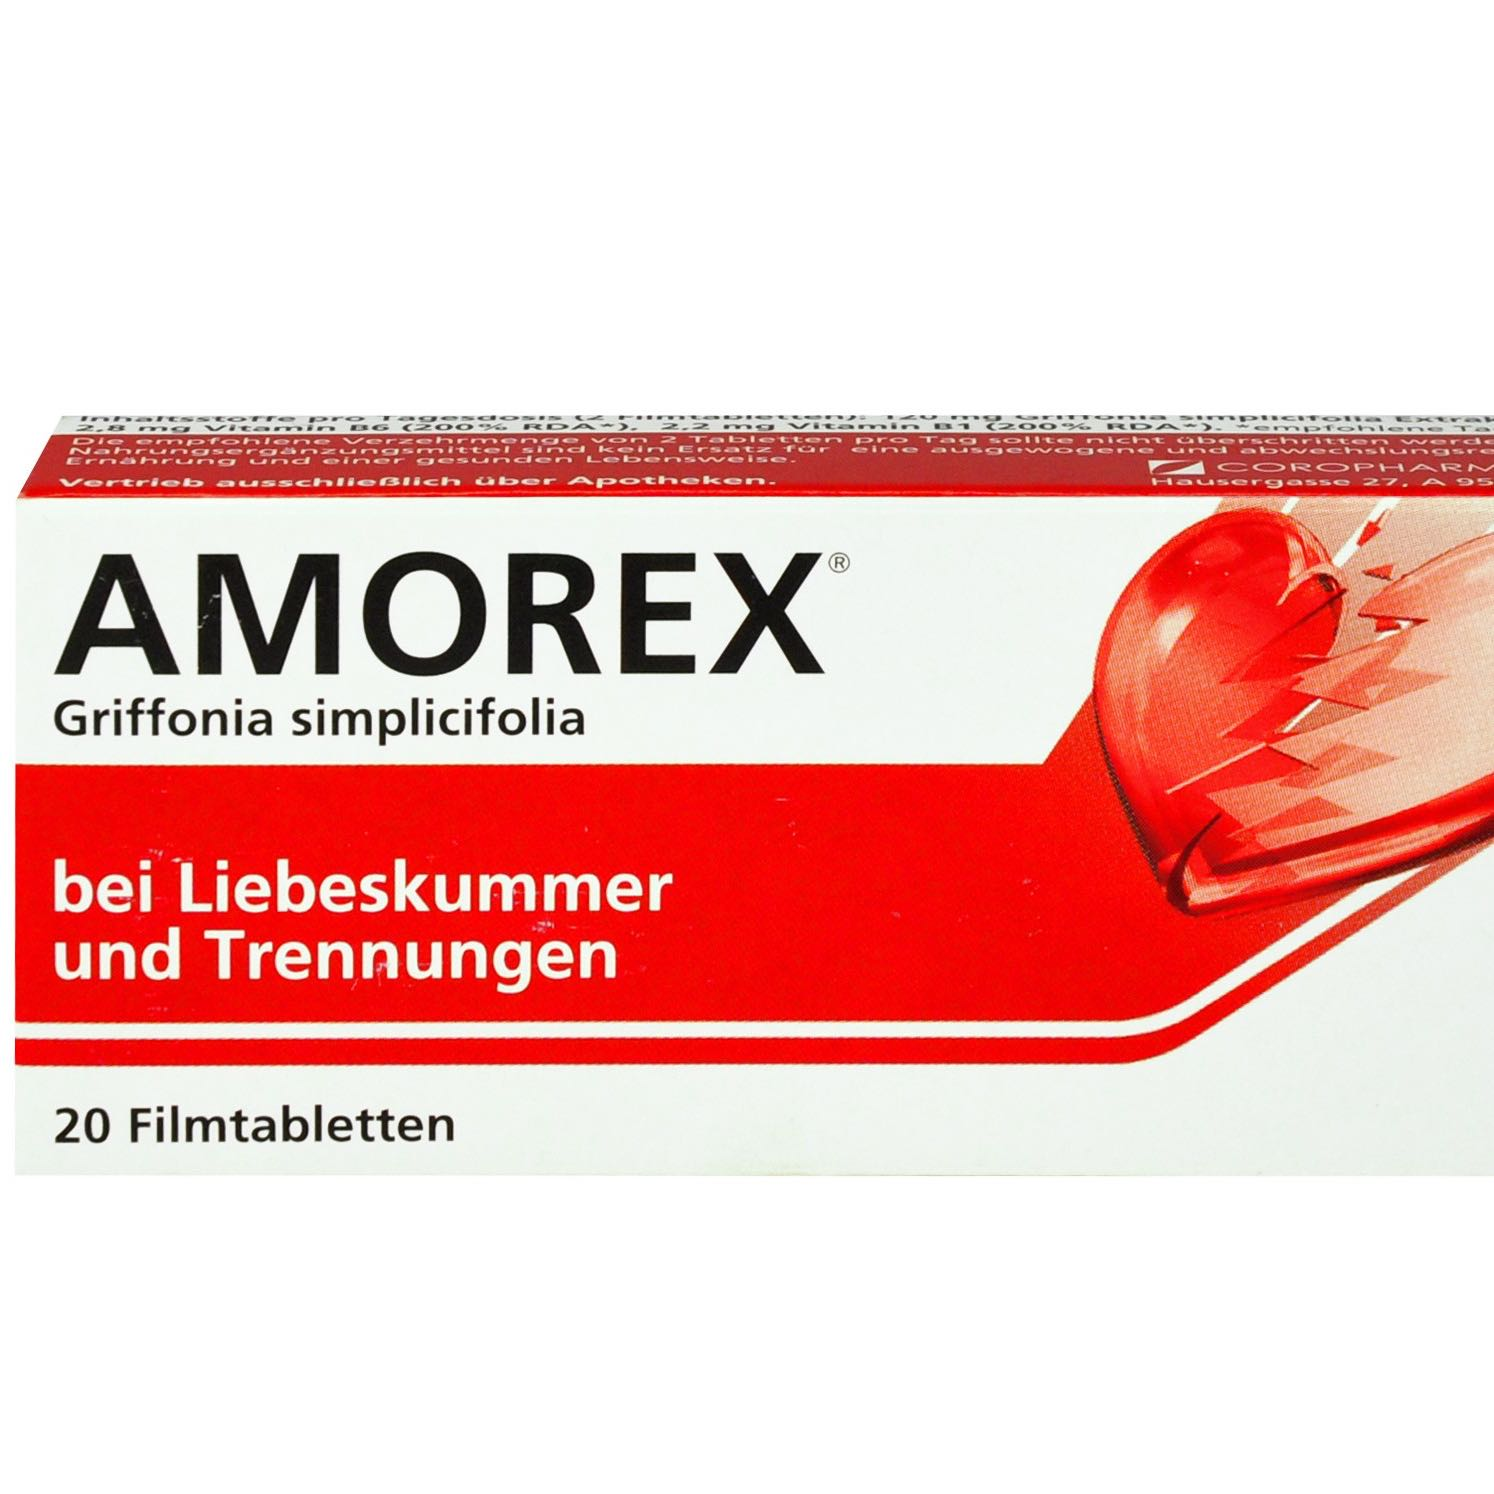 Amorex in berlin?